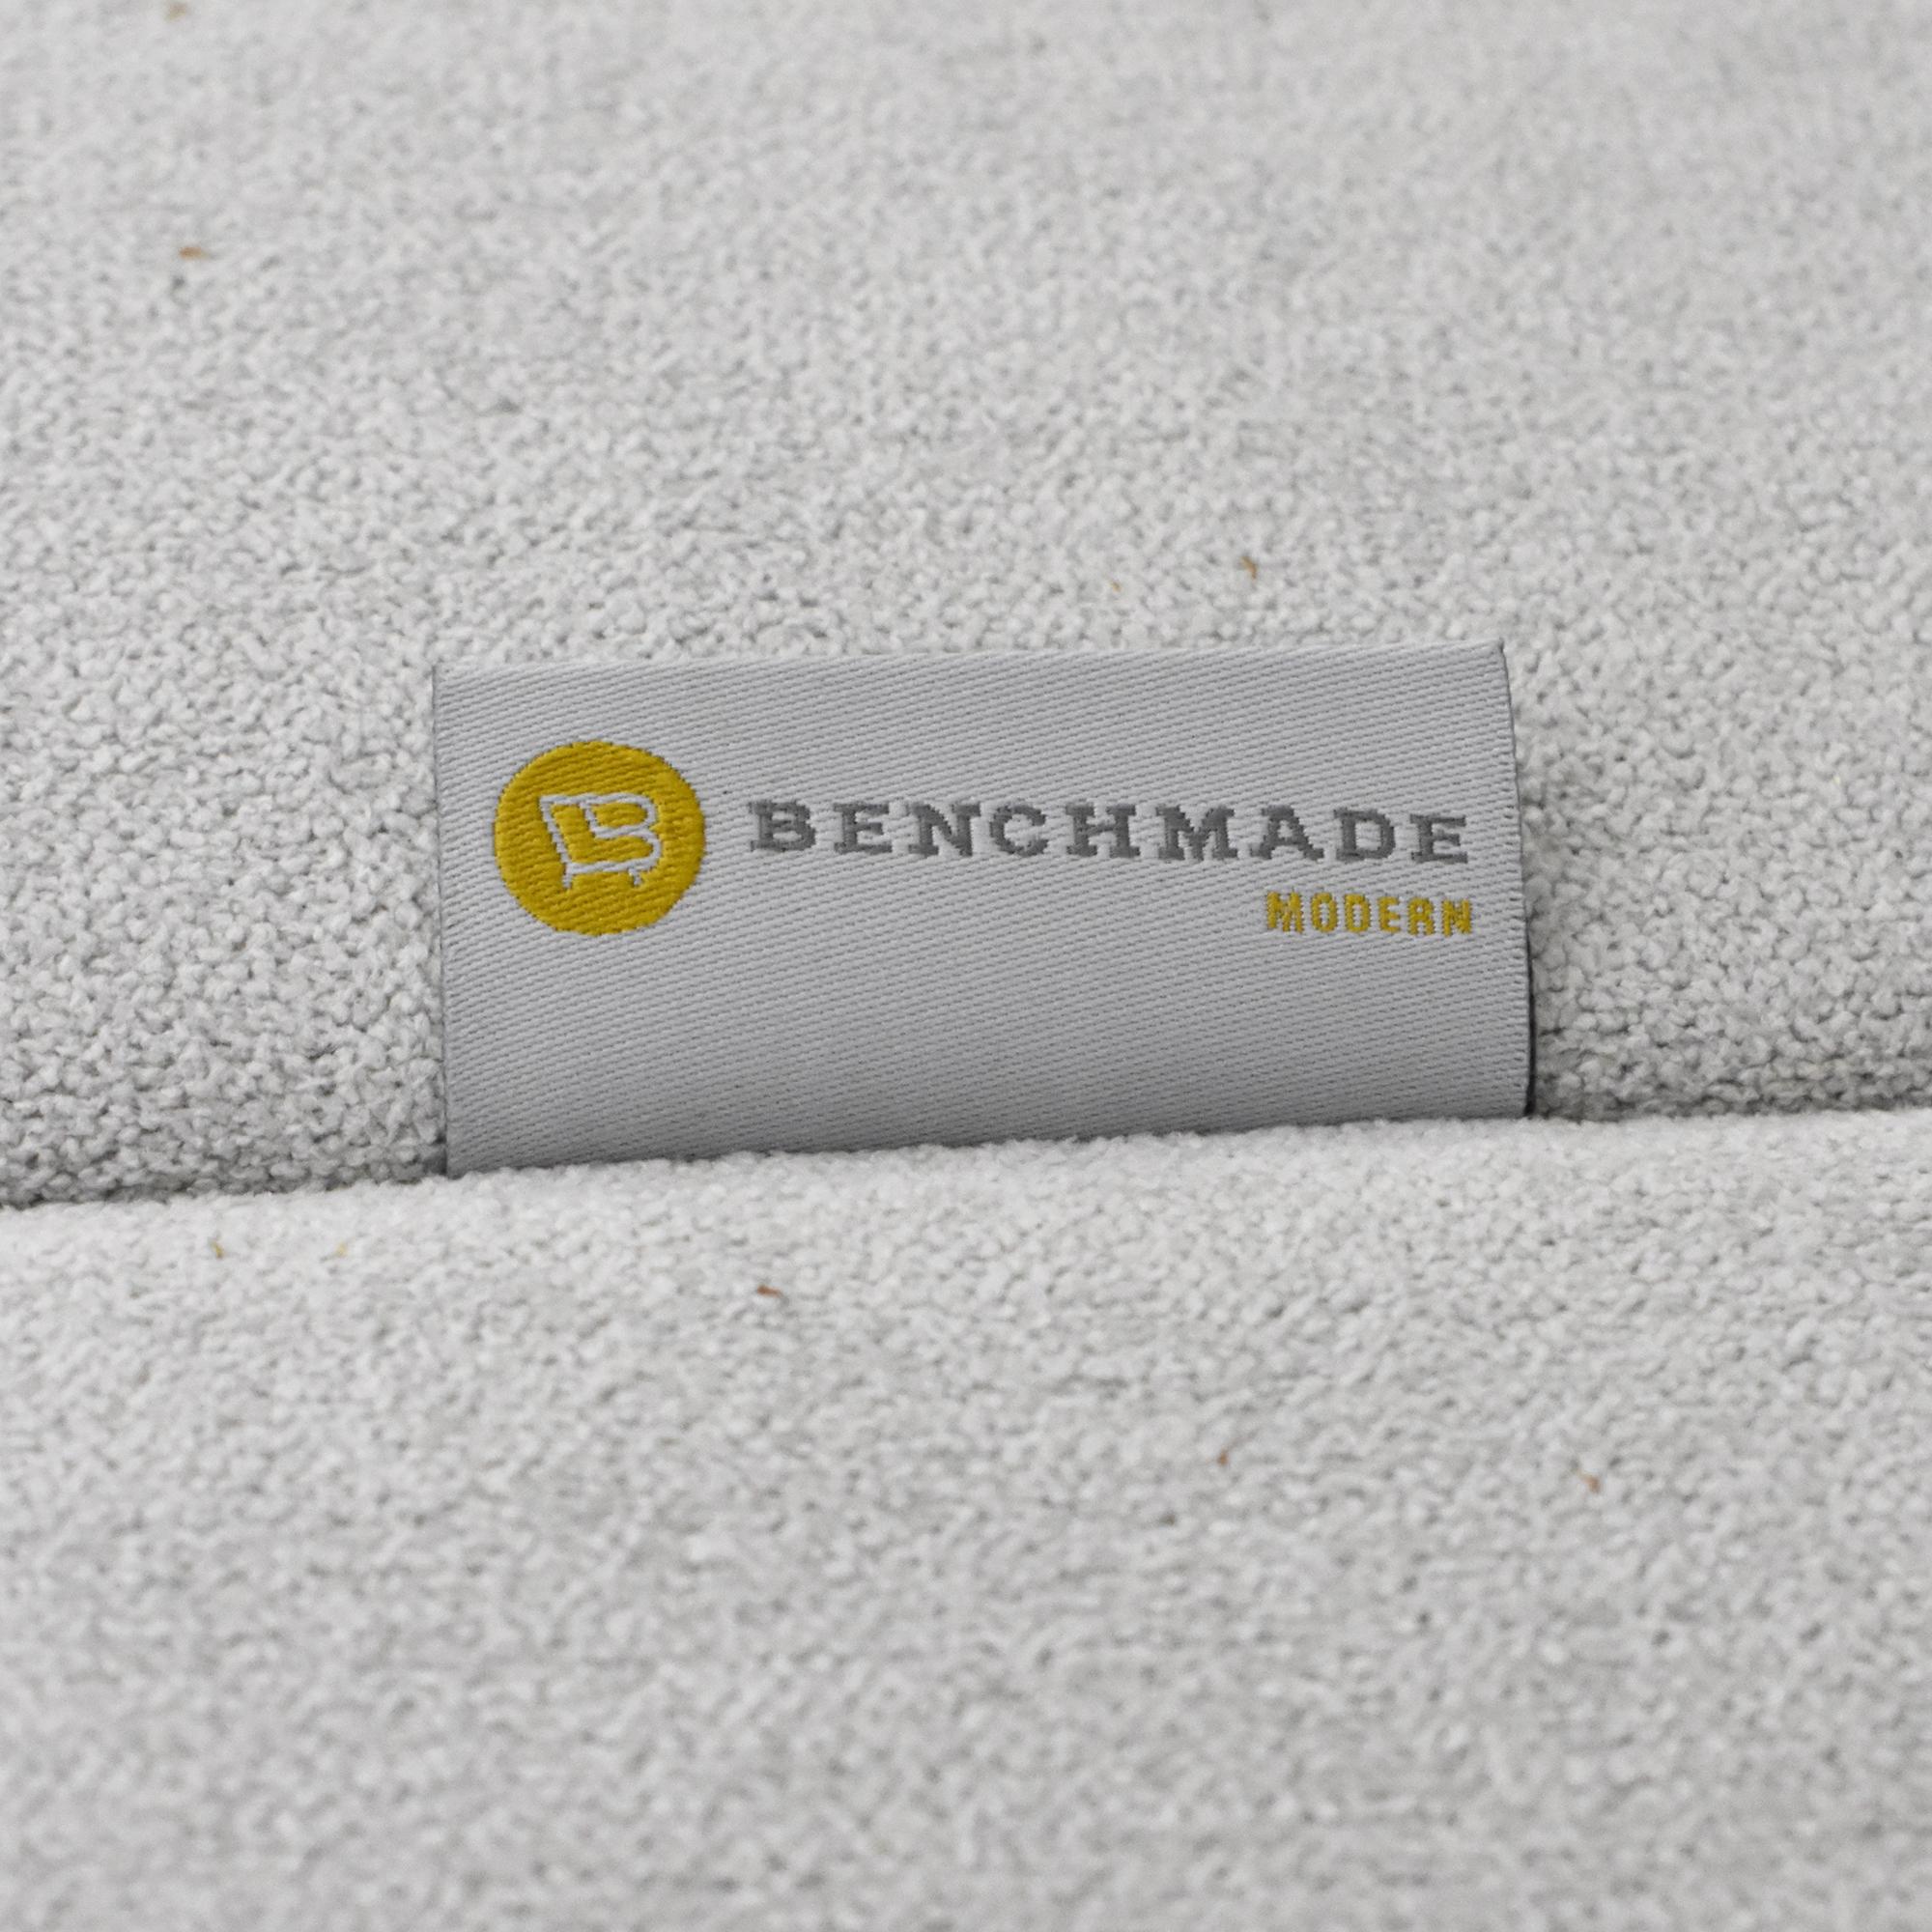 BenchMade Modern BenchMade Modern Skinny Fat Sofa discount